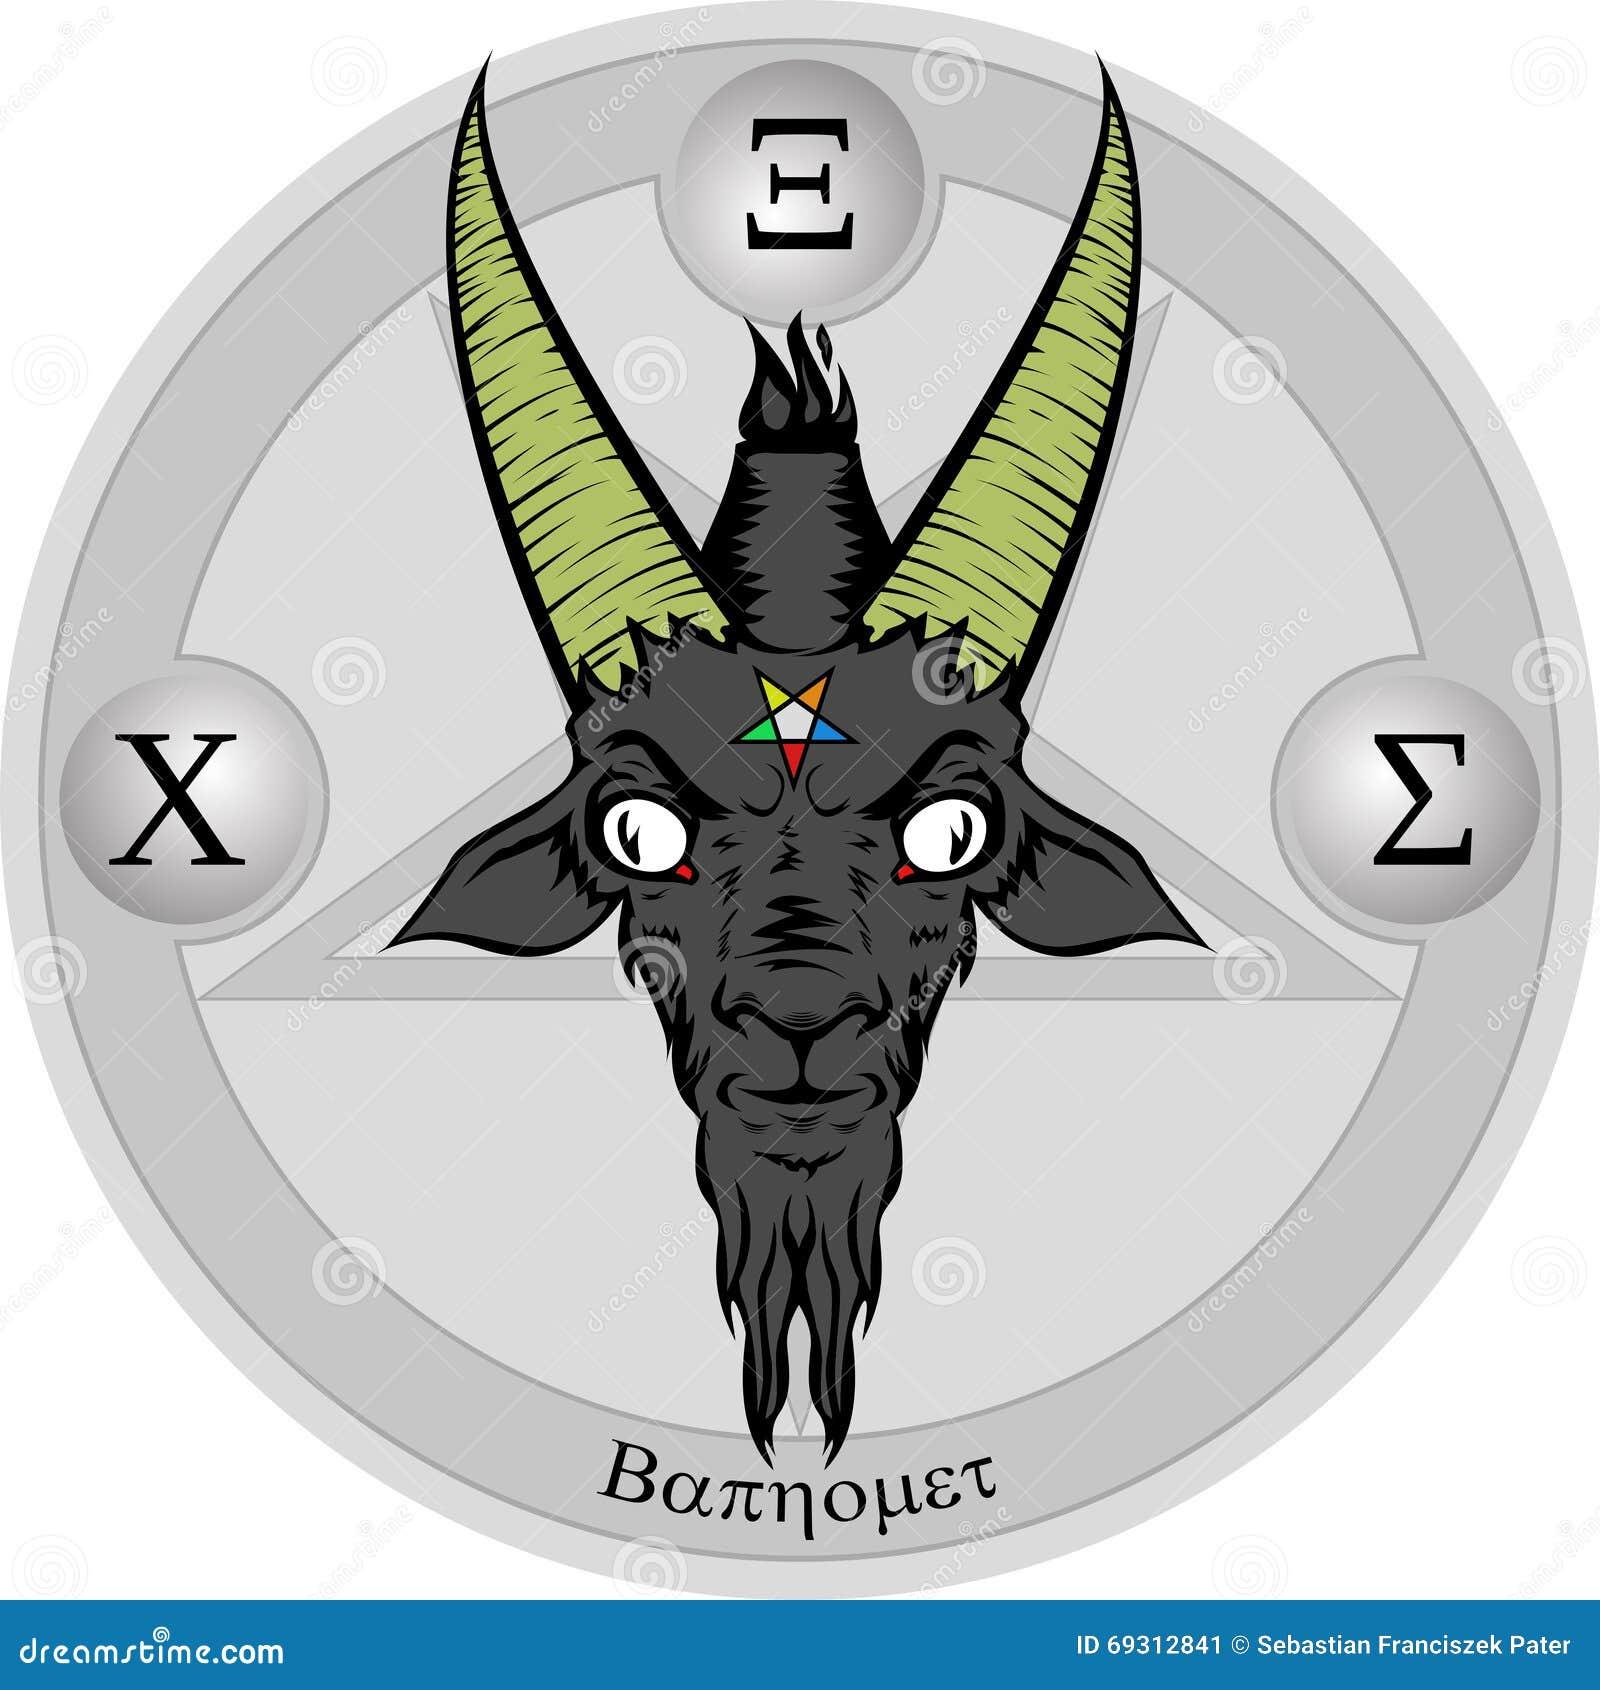 Baphomet Sign stock vector  Illustration of demons, design